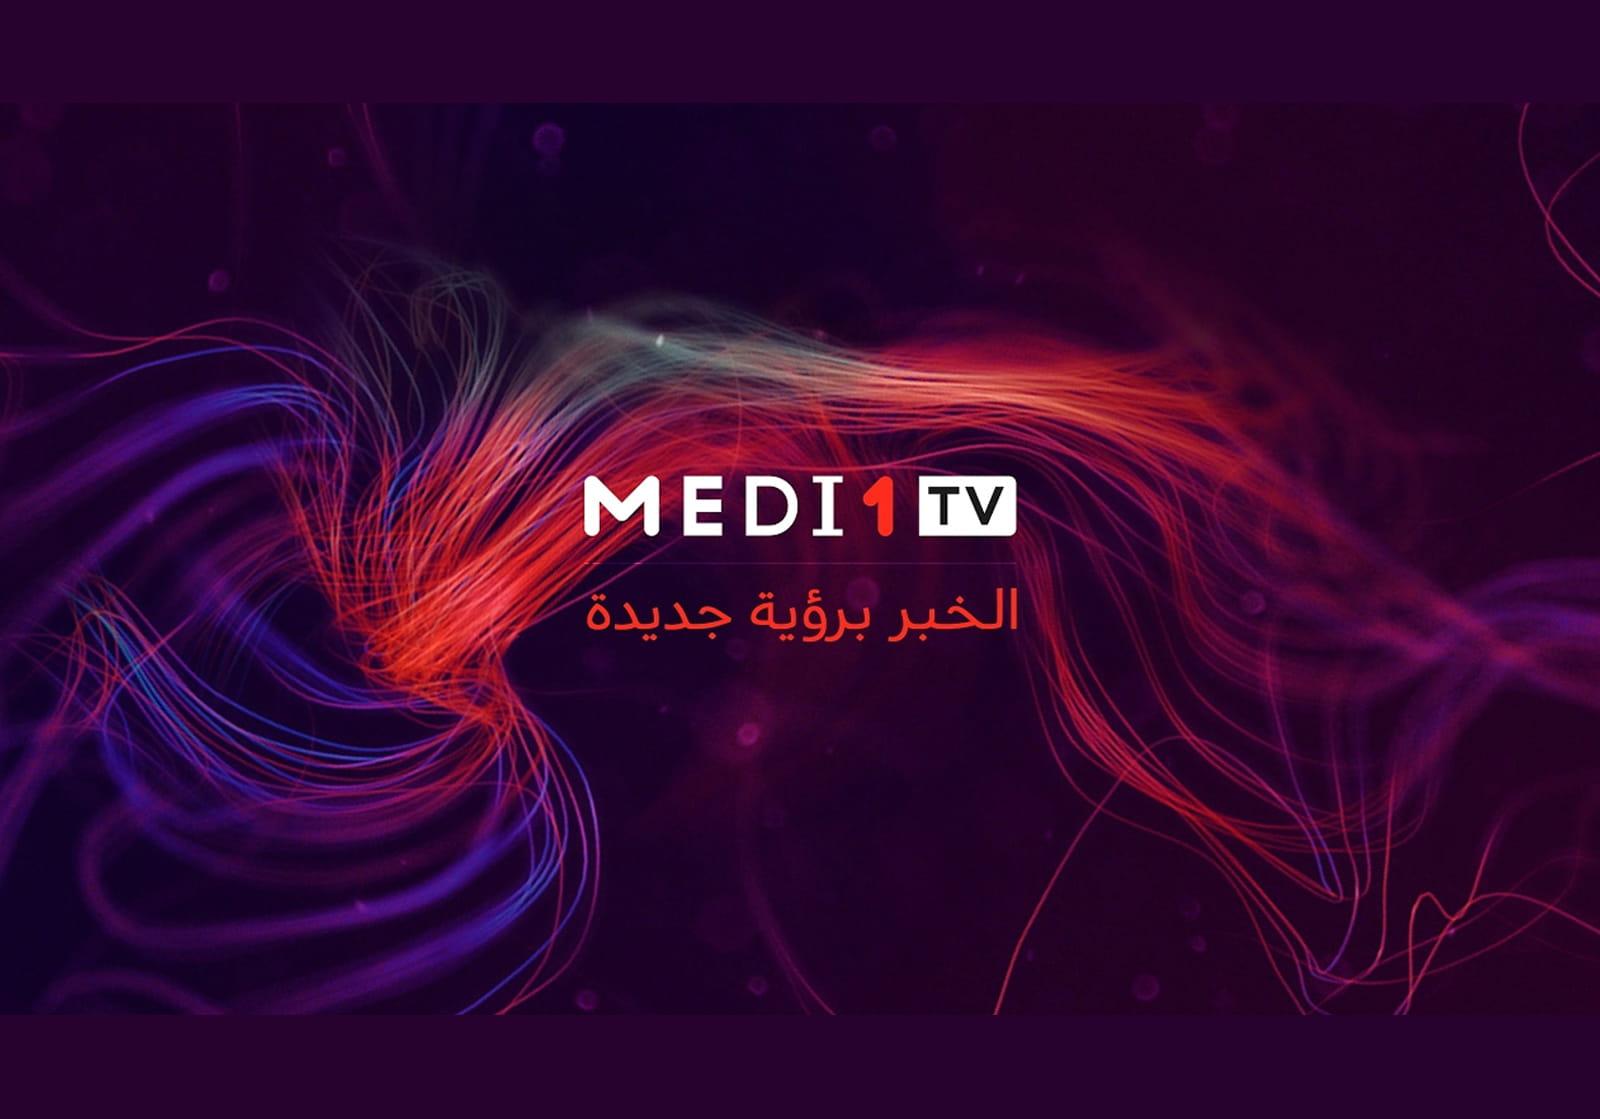 Medi1TV : Un milliard et demi de vidéos vues